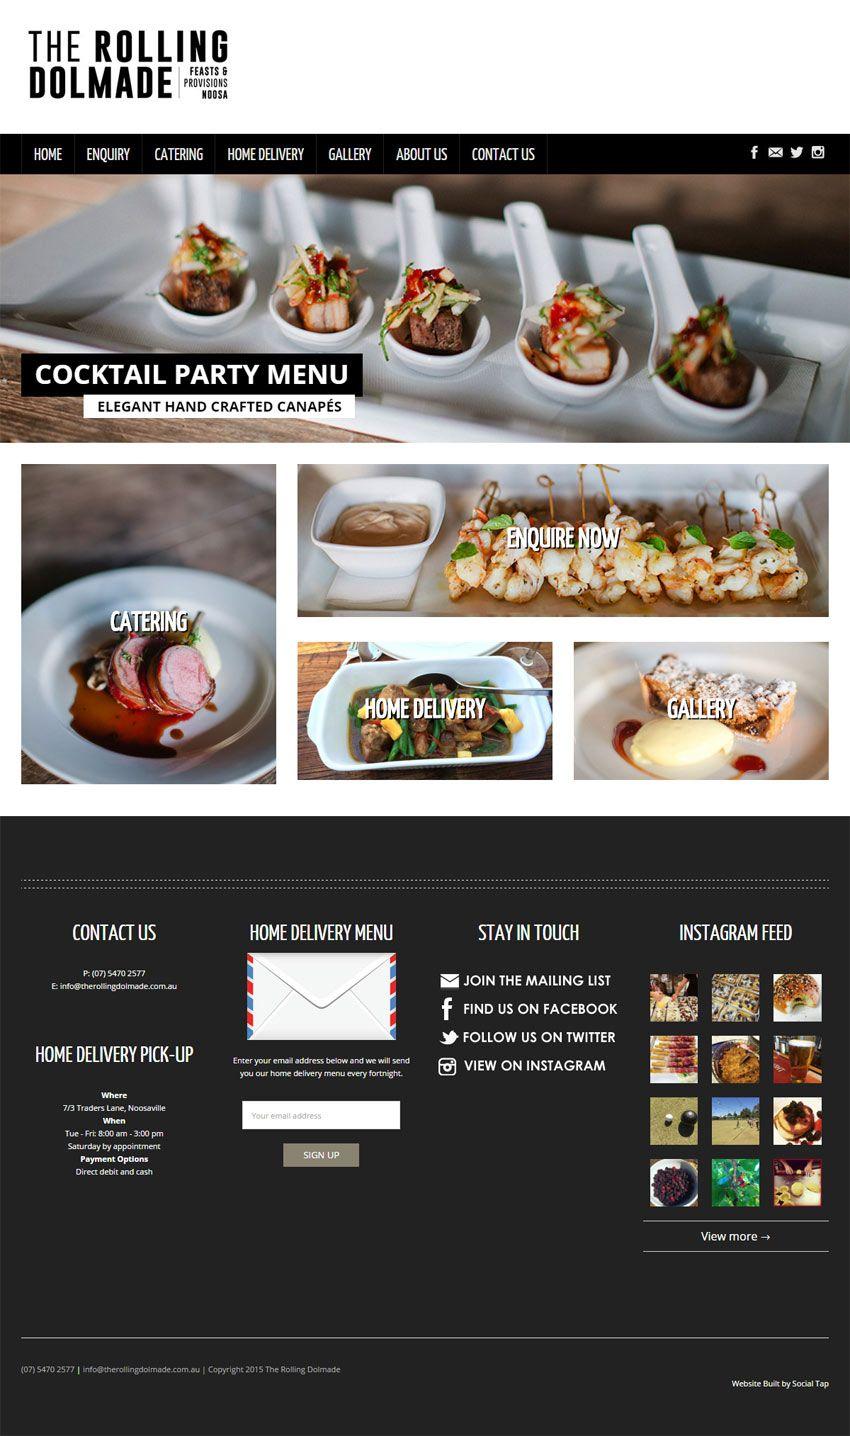 Website design for rolling dolmade catering in noosa qld australia website forumfinder Gallery